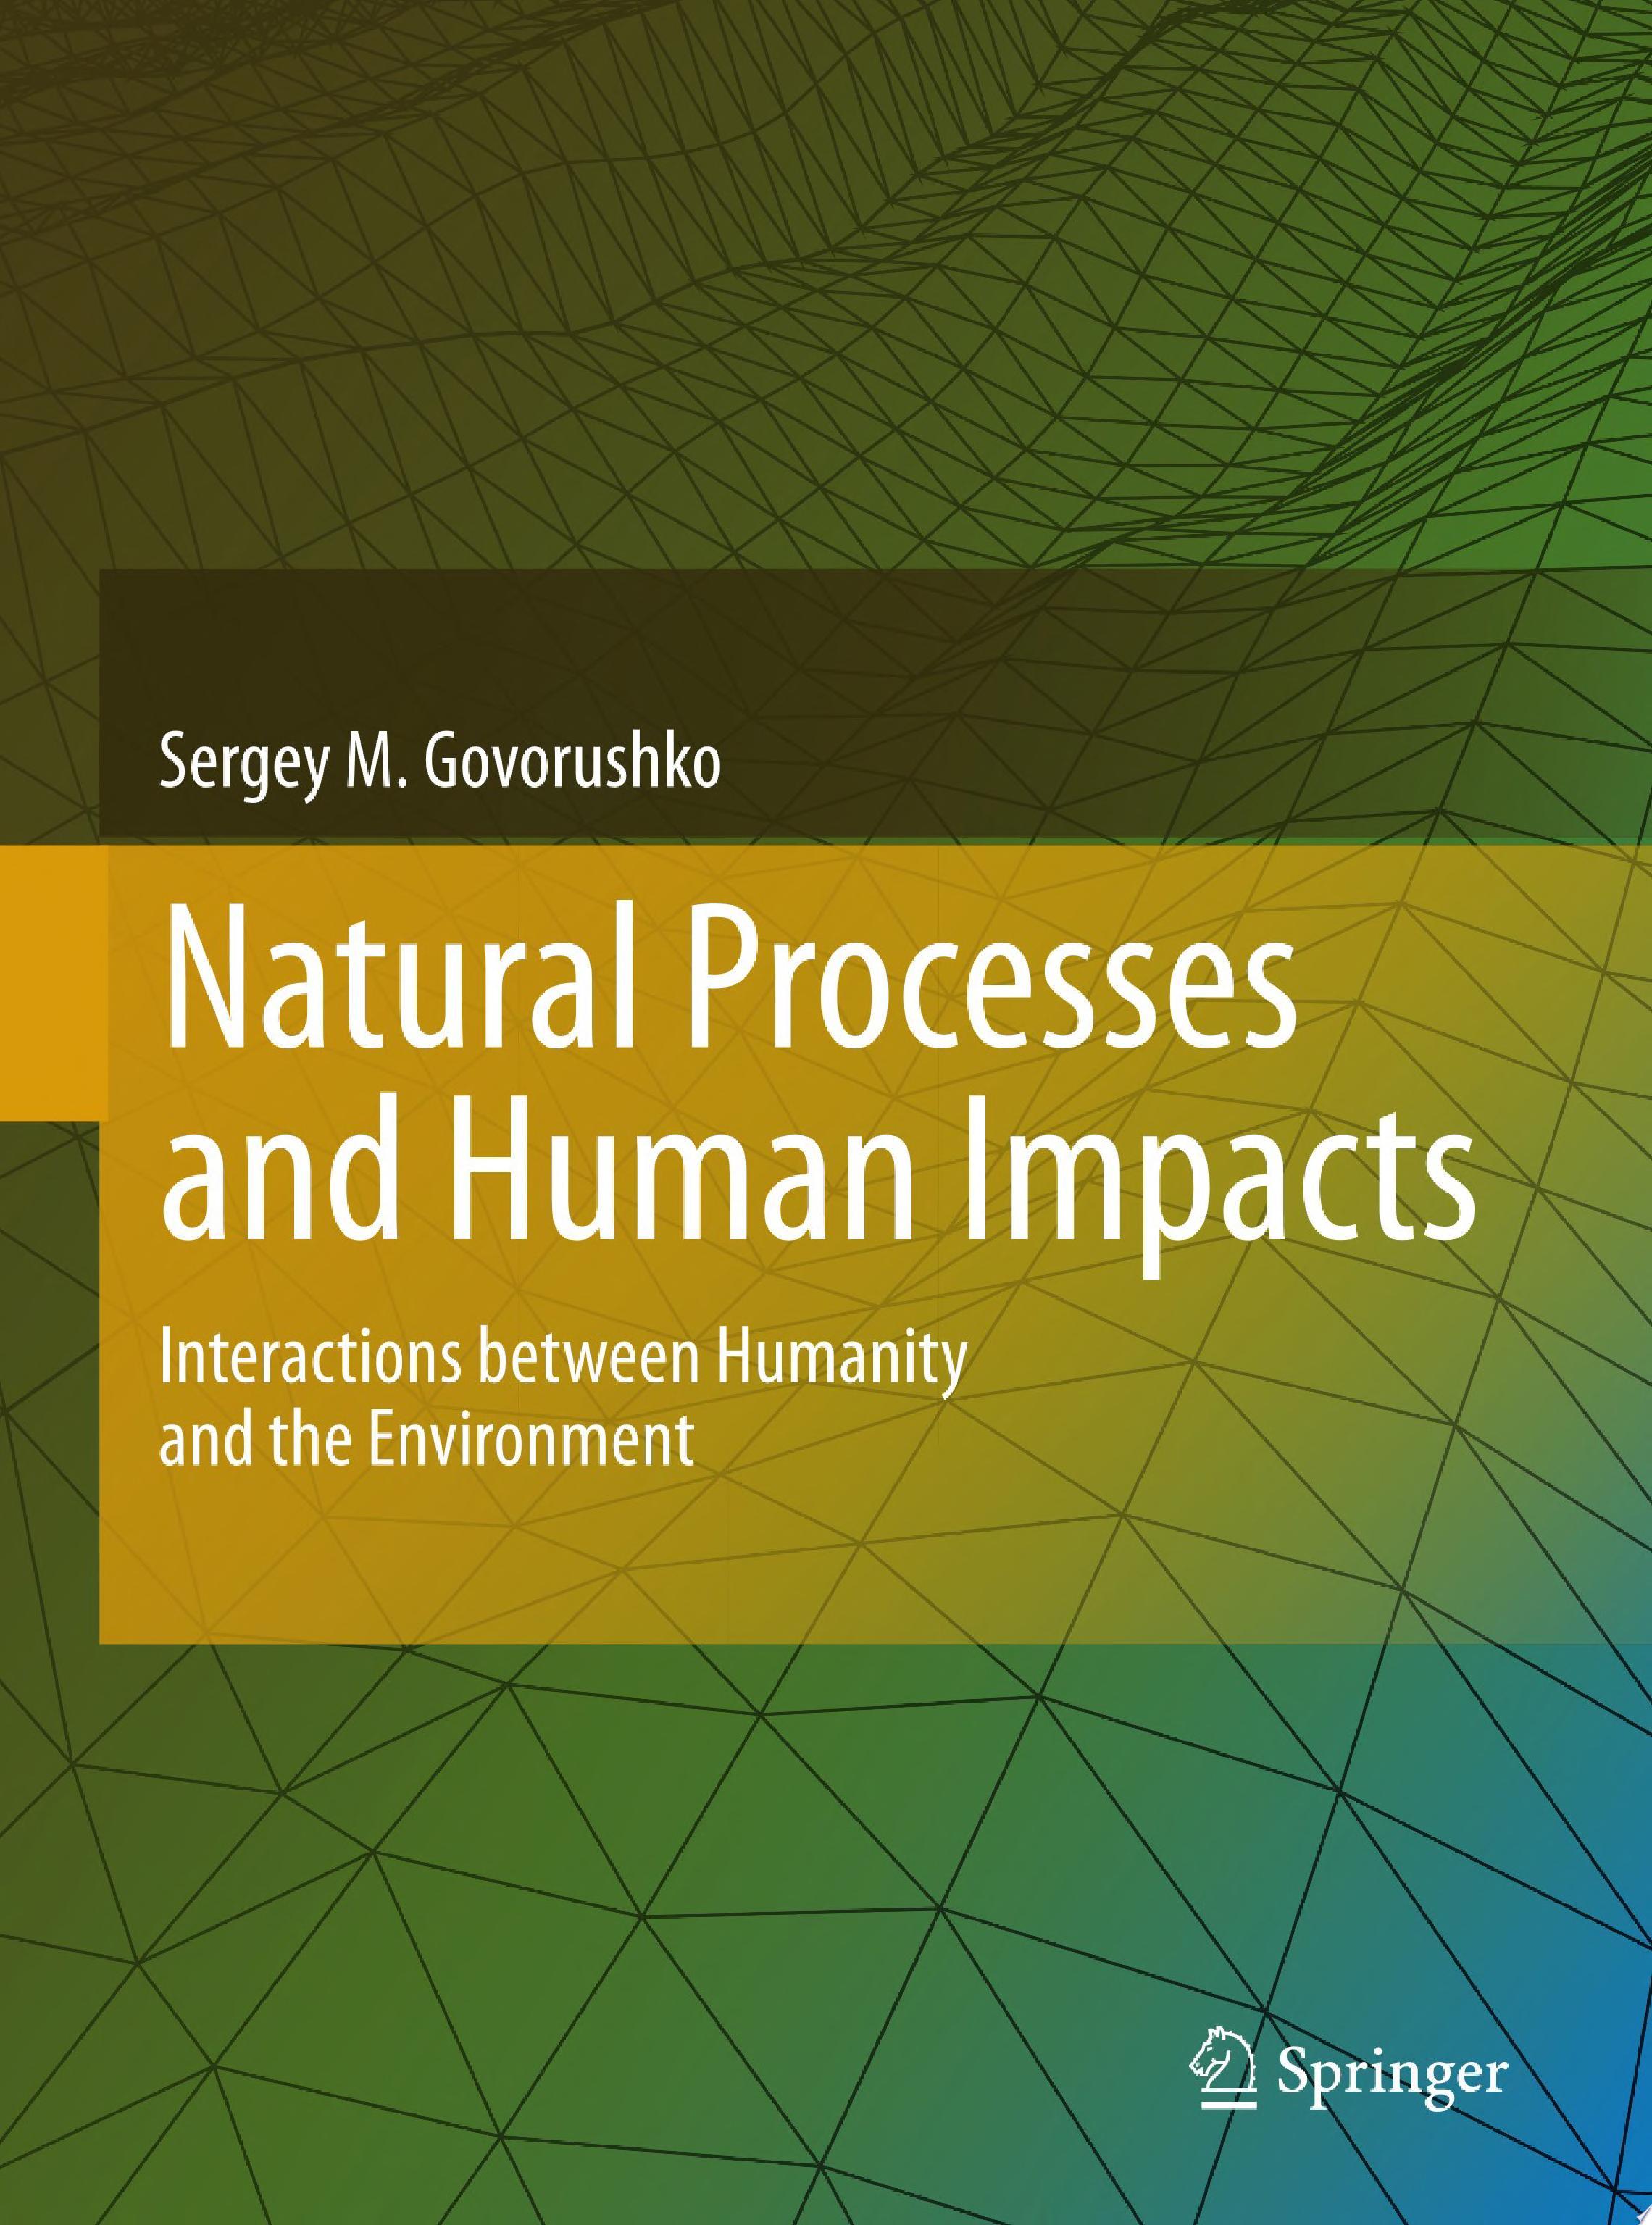 Natural Processes and Human Impacts